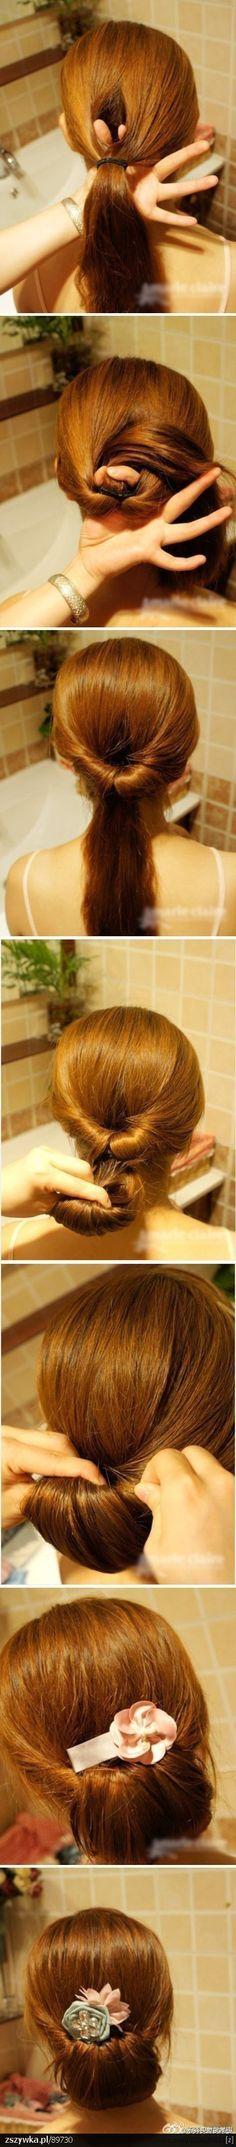 aww, my fav hairstyle